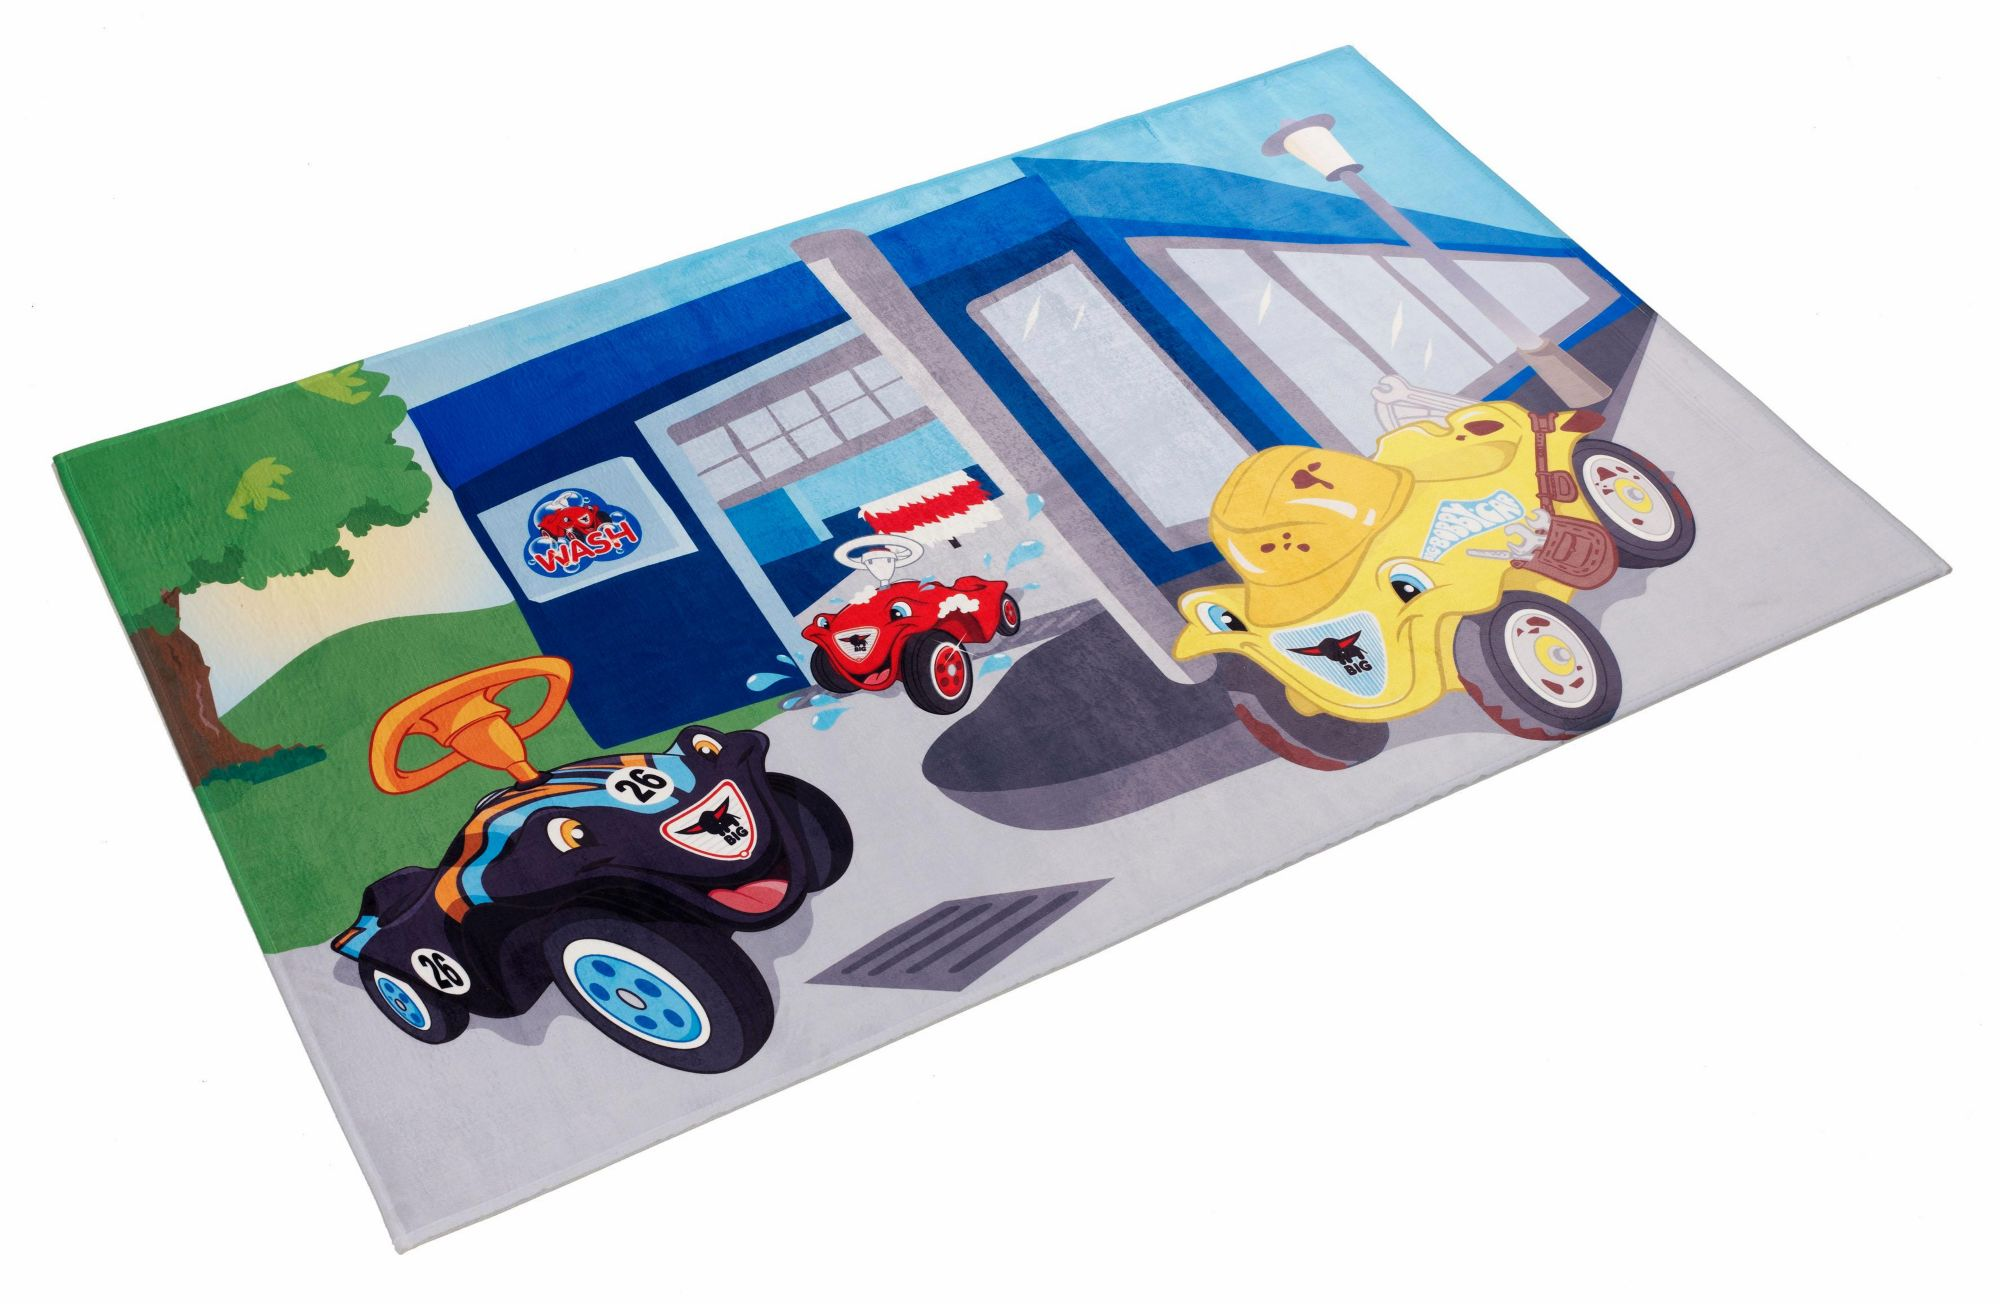 BOBBY CAR Kinderteppich, »Bobby Car 104«, Bobby Car, rechteckig, Höhe 6 mm, gedruckt